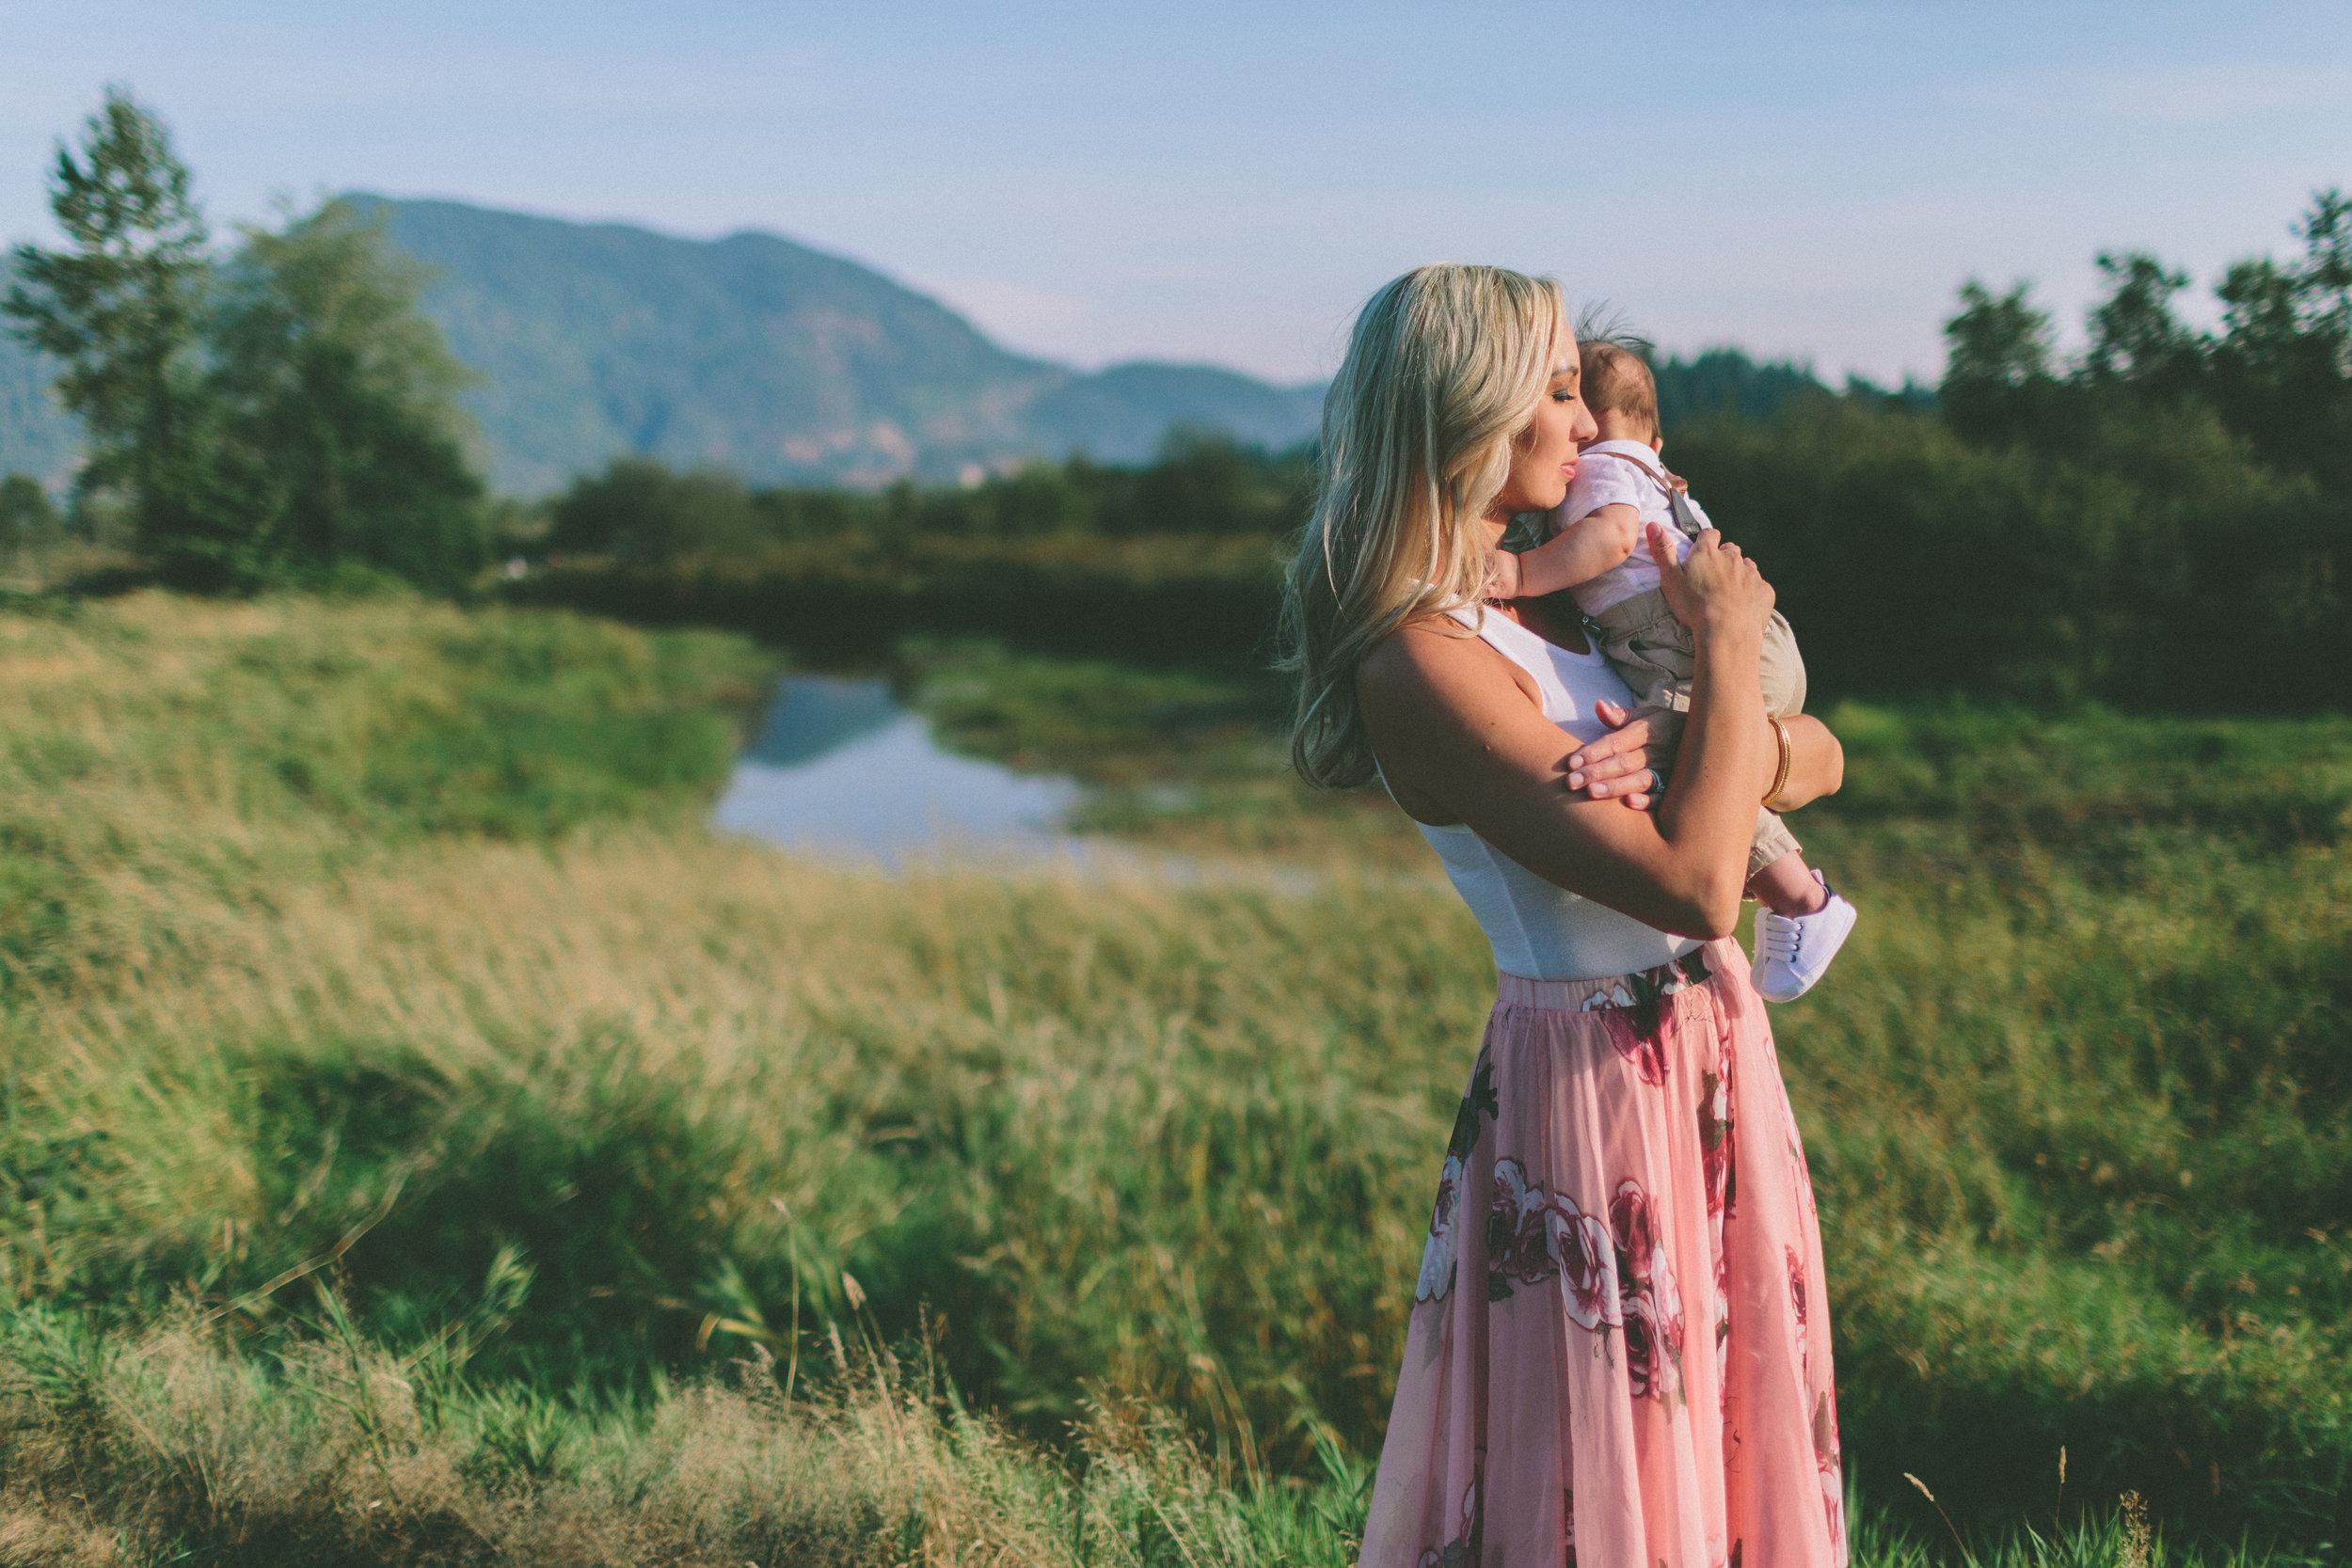 The Bozek Family - at Pitt Lake